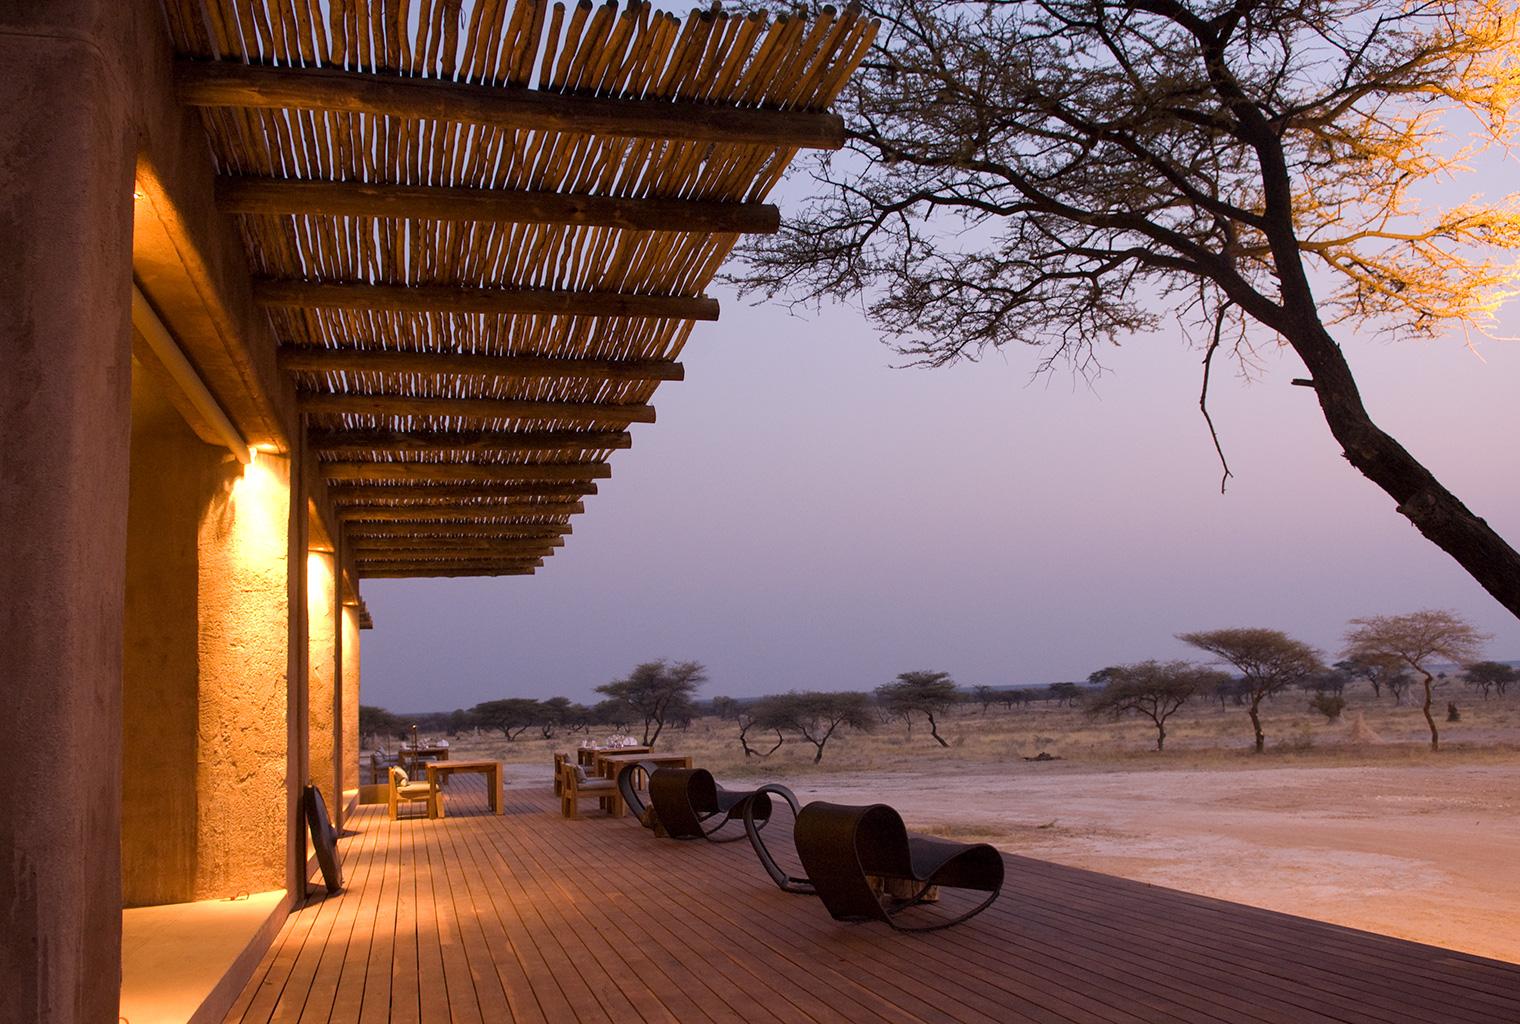 Onguma-The-Fort--Namibia-Deck